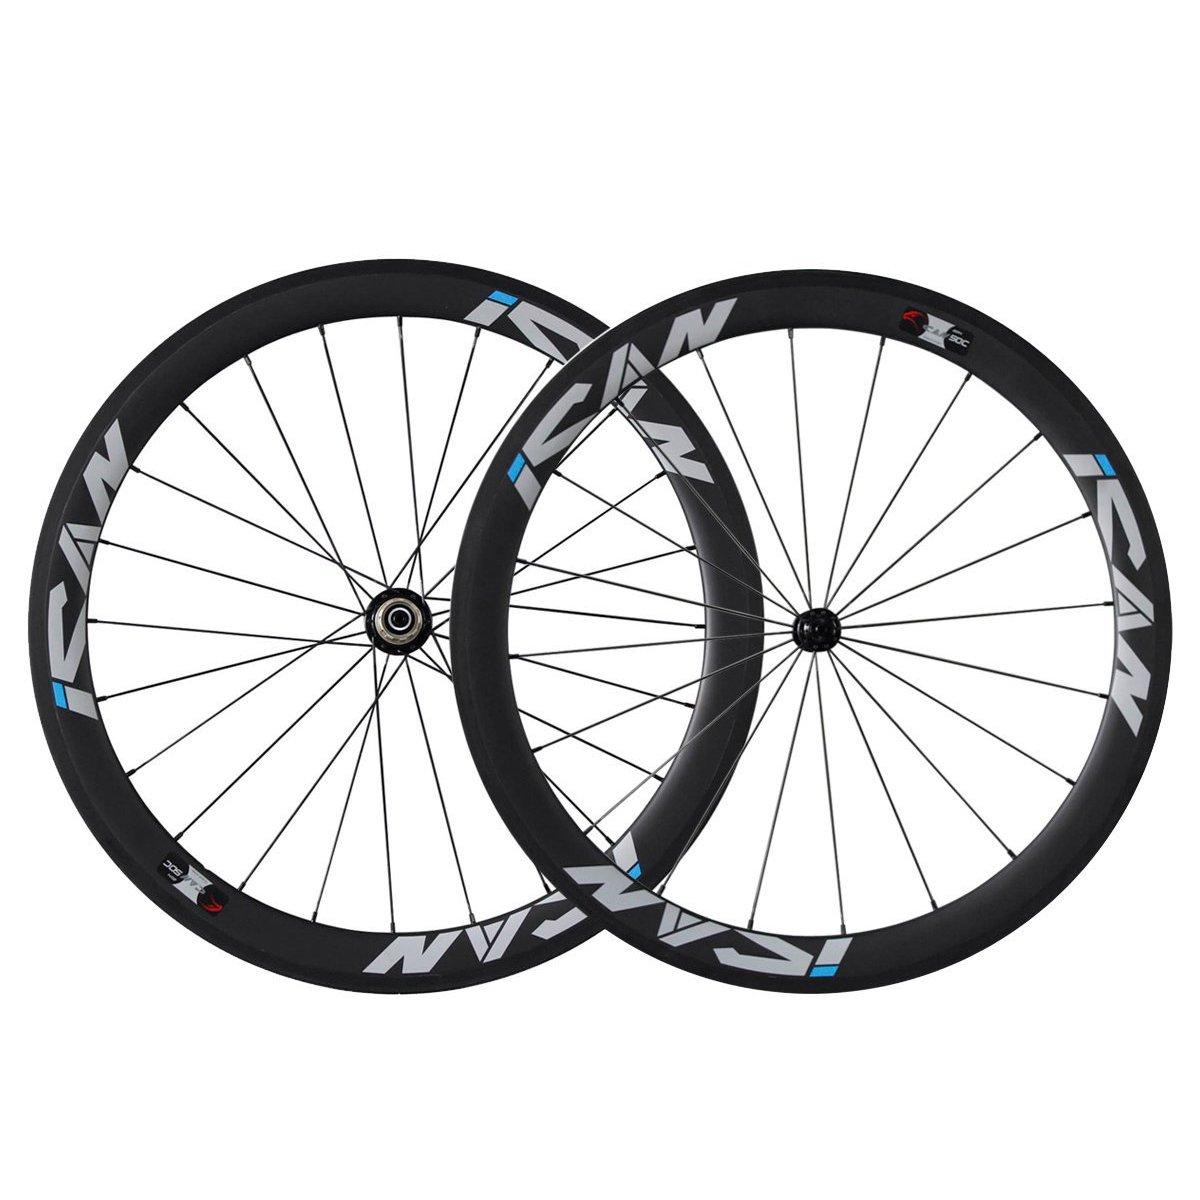 ICAN Carbon Road Bike Tubular Wheelset 50mm Rim Shimano 10/11 Speed 20/24 Holes 1330g